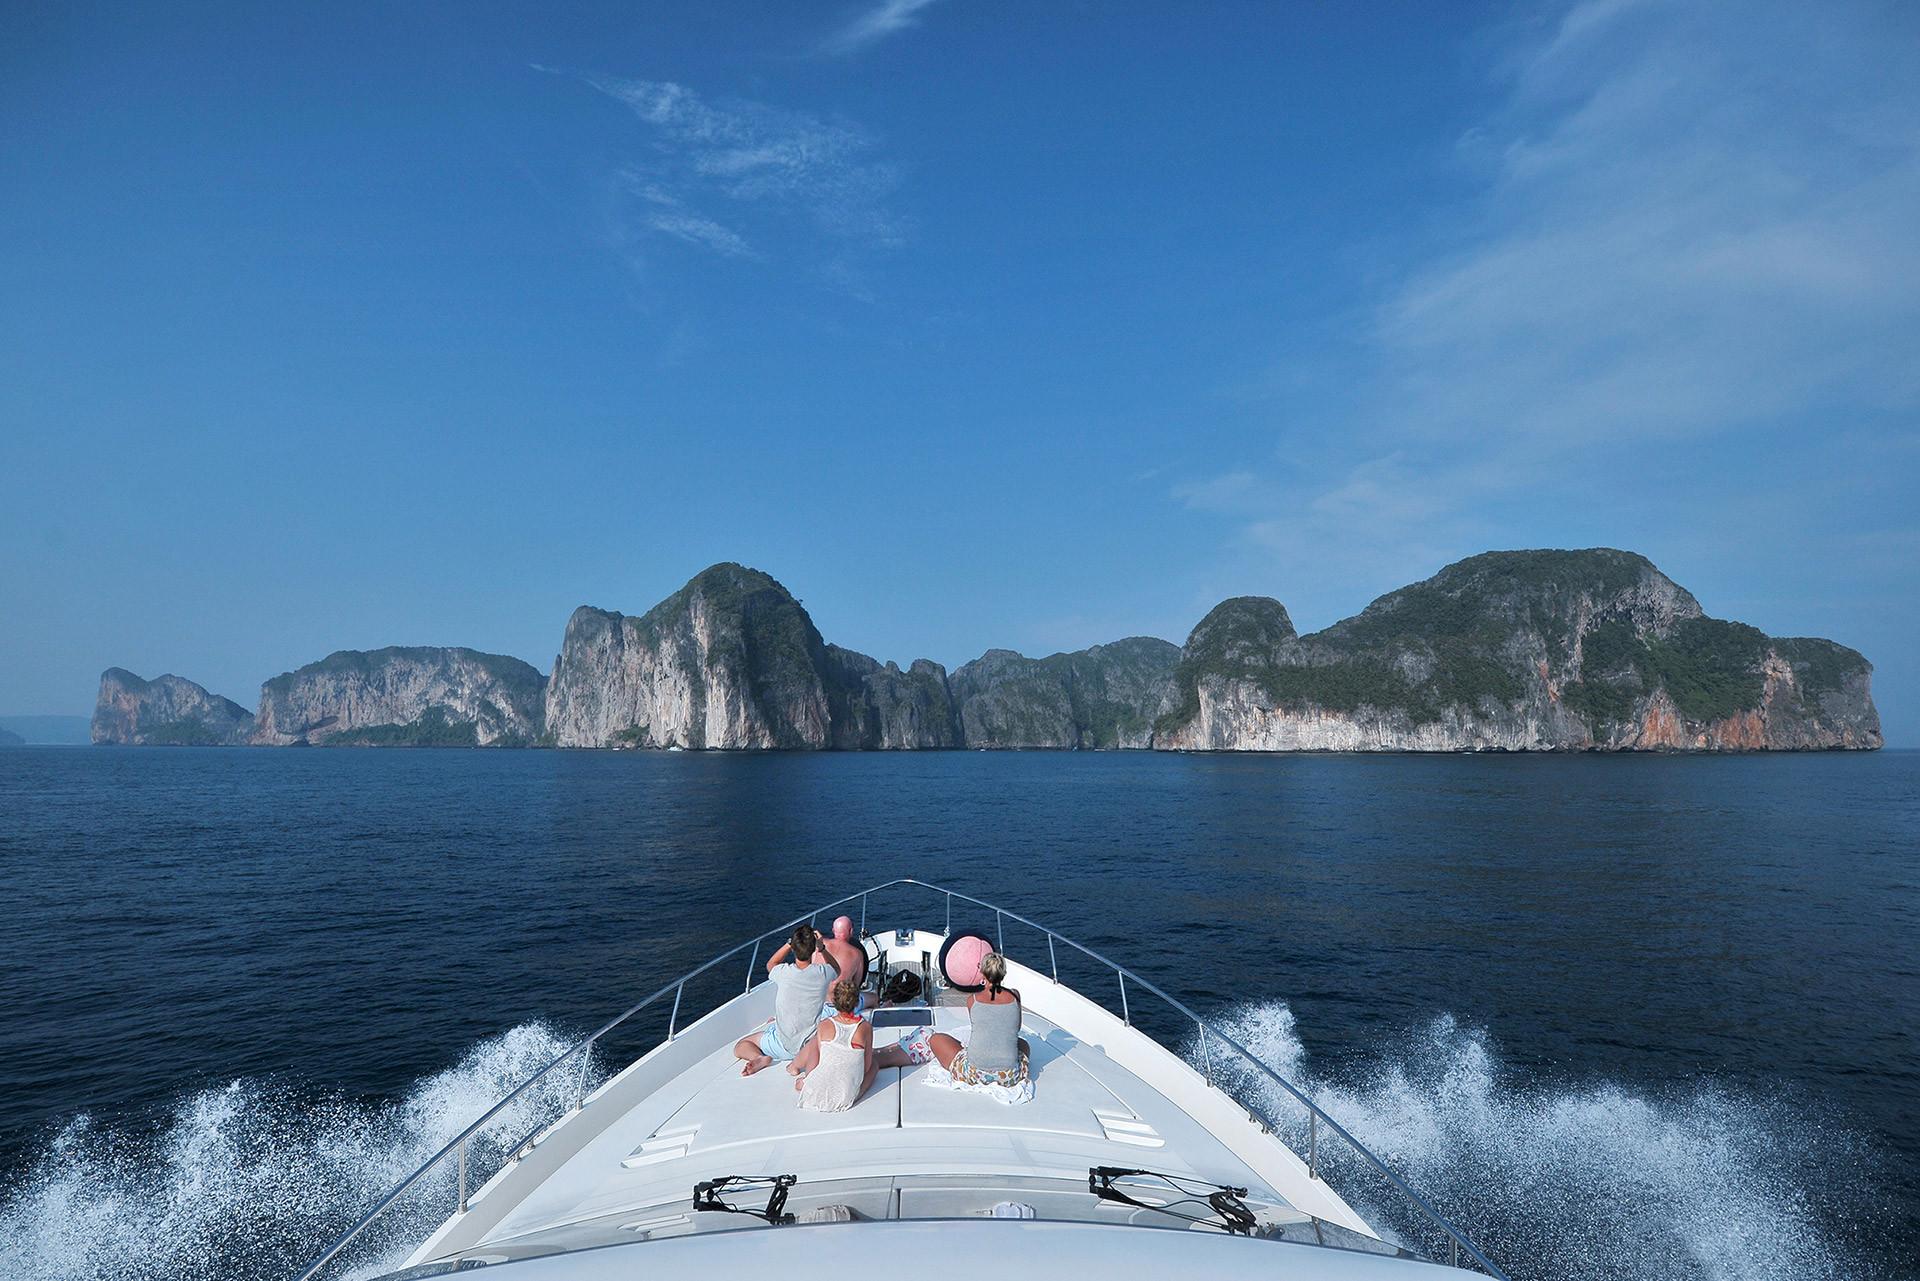 Wahoo Phuket Boat & Yacht Charter   Kata Rocks Resort Phuket Thailand